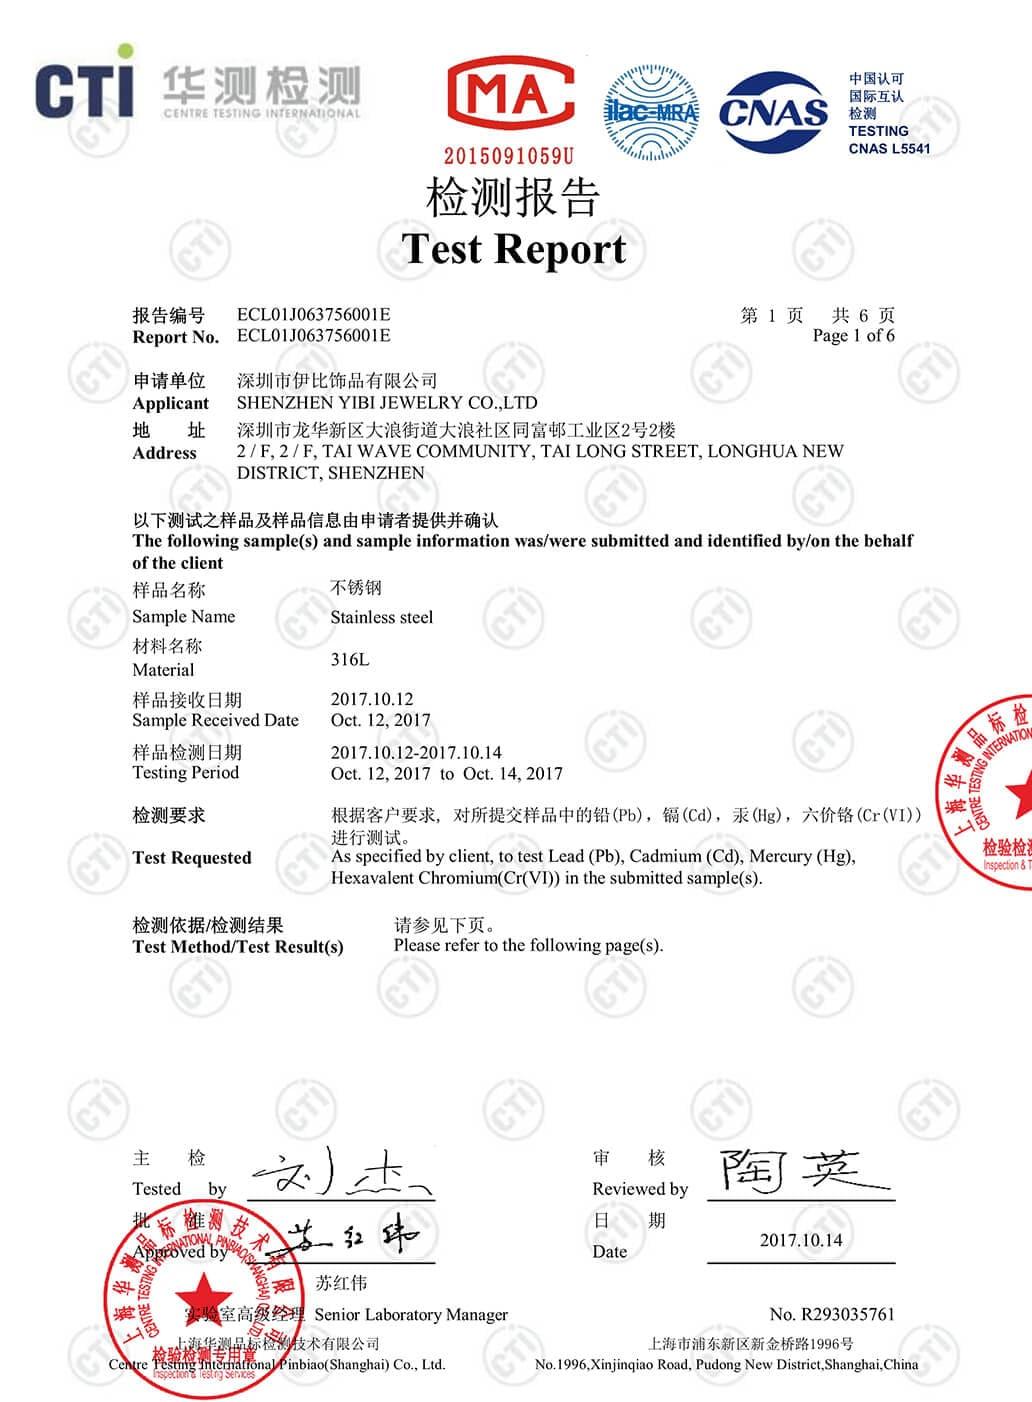 YIBI Jewelry  CTI Certification